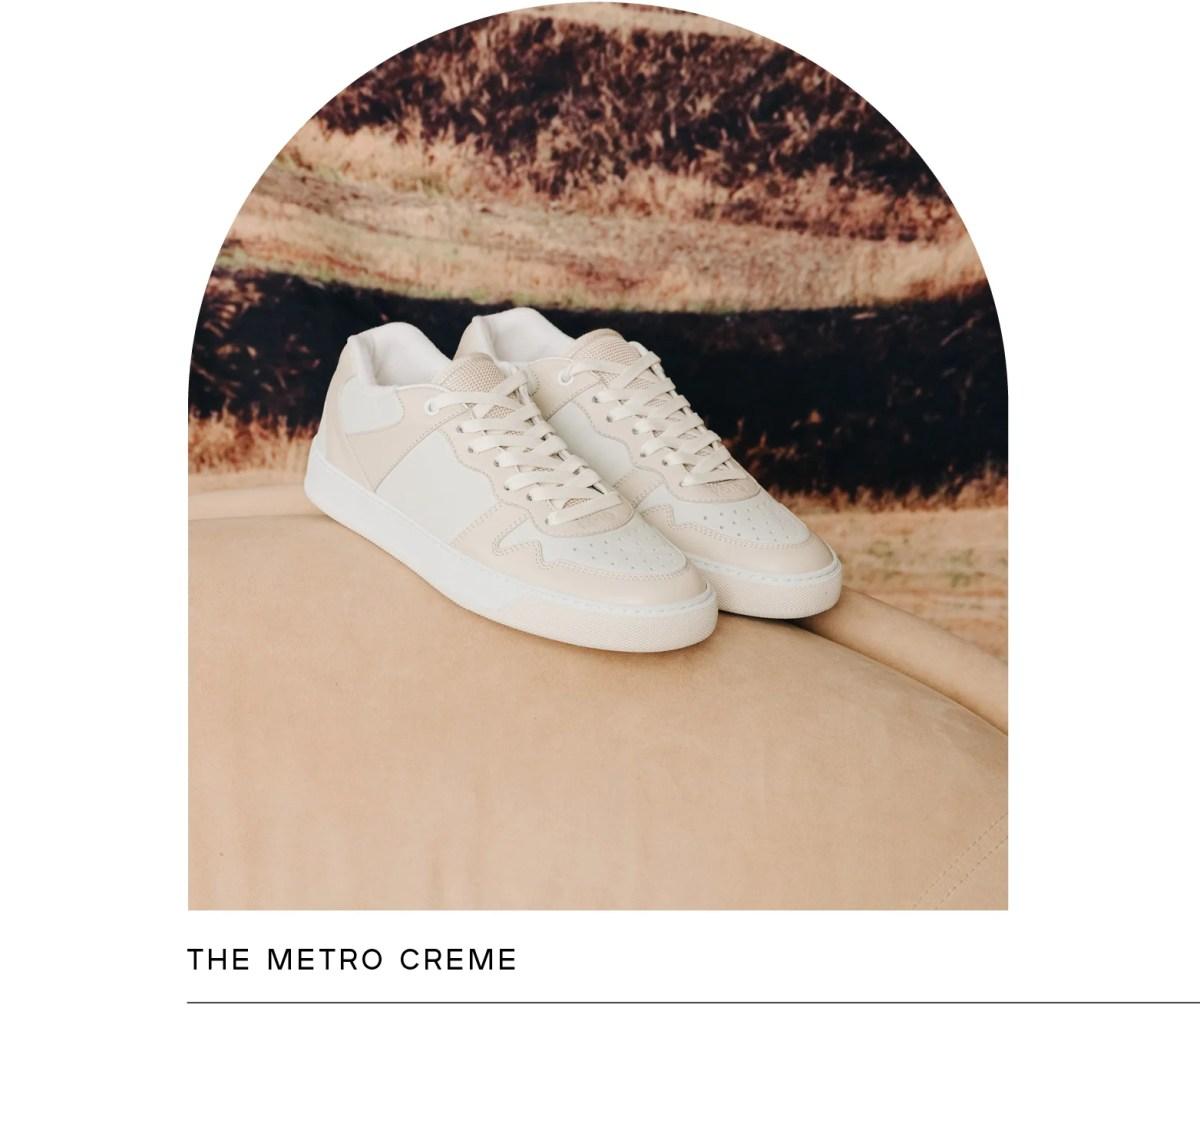 The Metro Creme